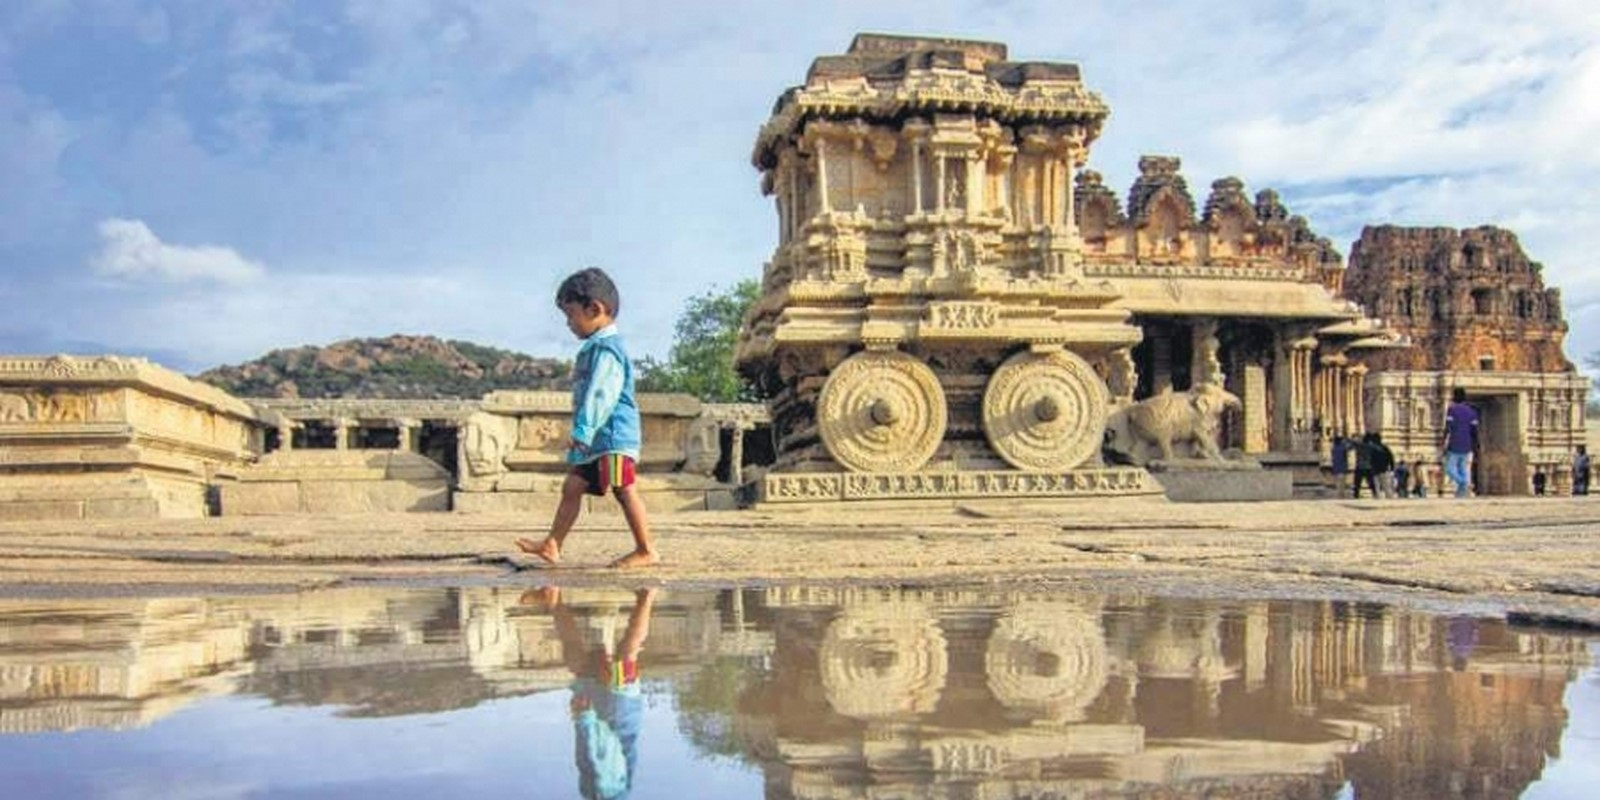 Ruins of the Vijayanagara Empire, Hampi, Karnataka - Sheet1